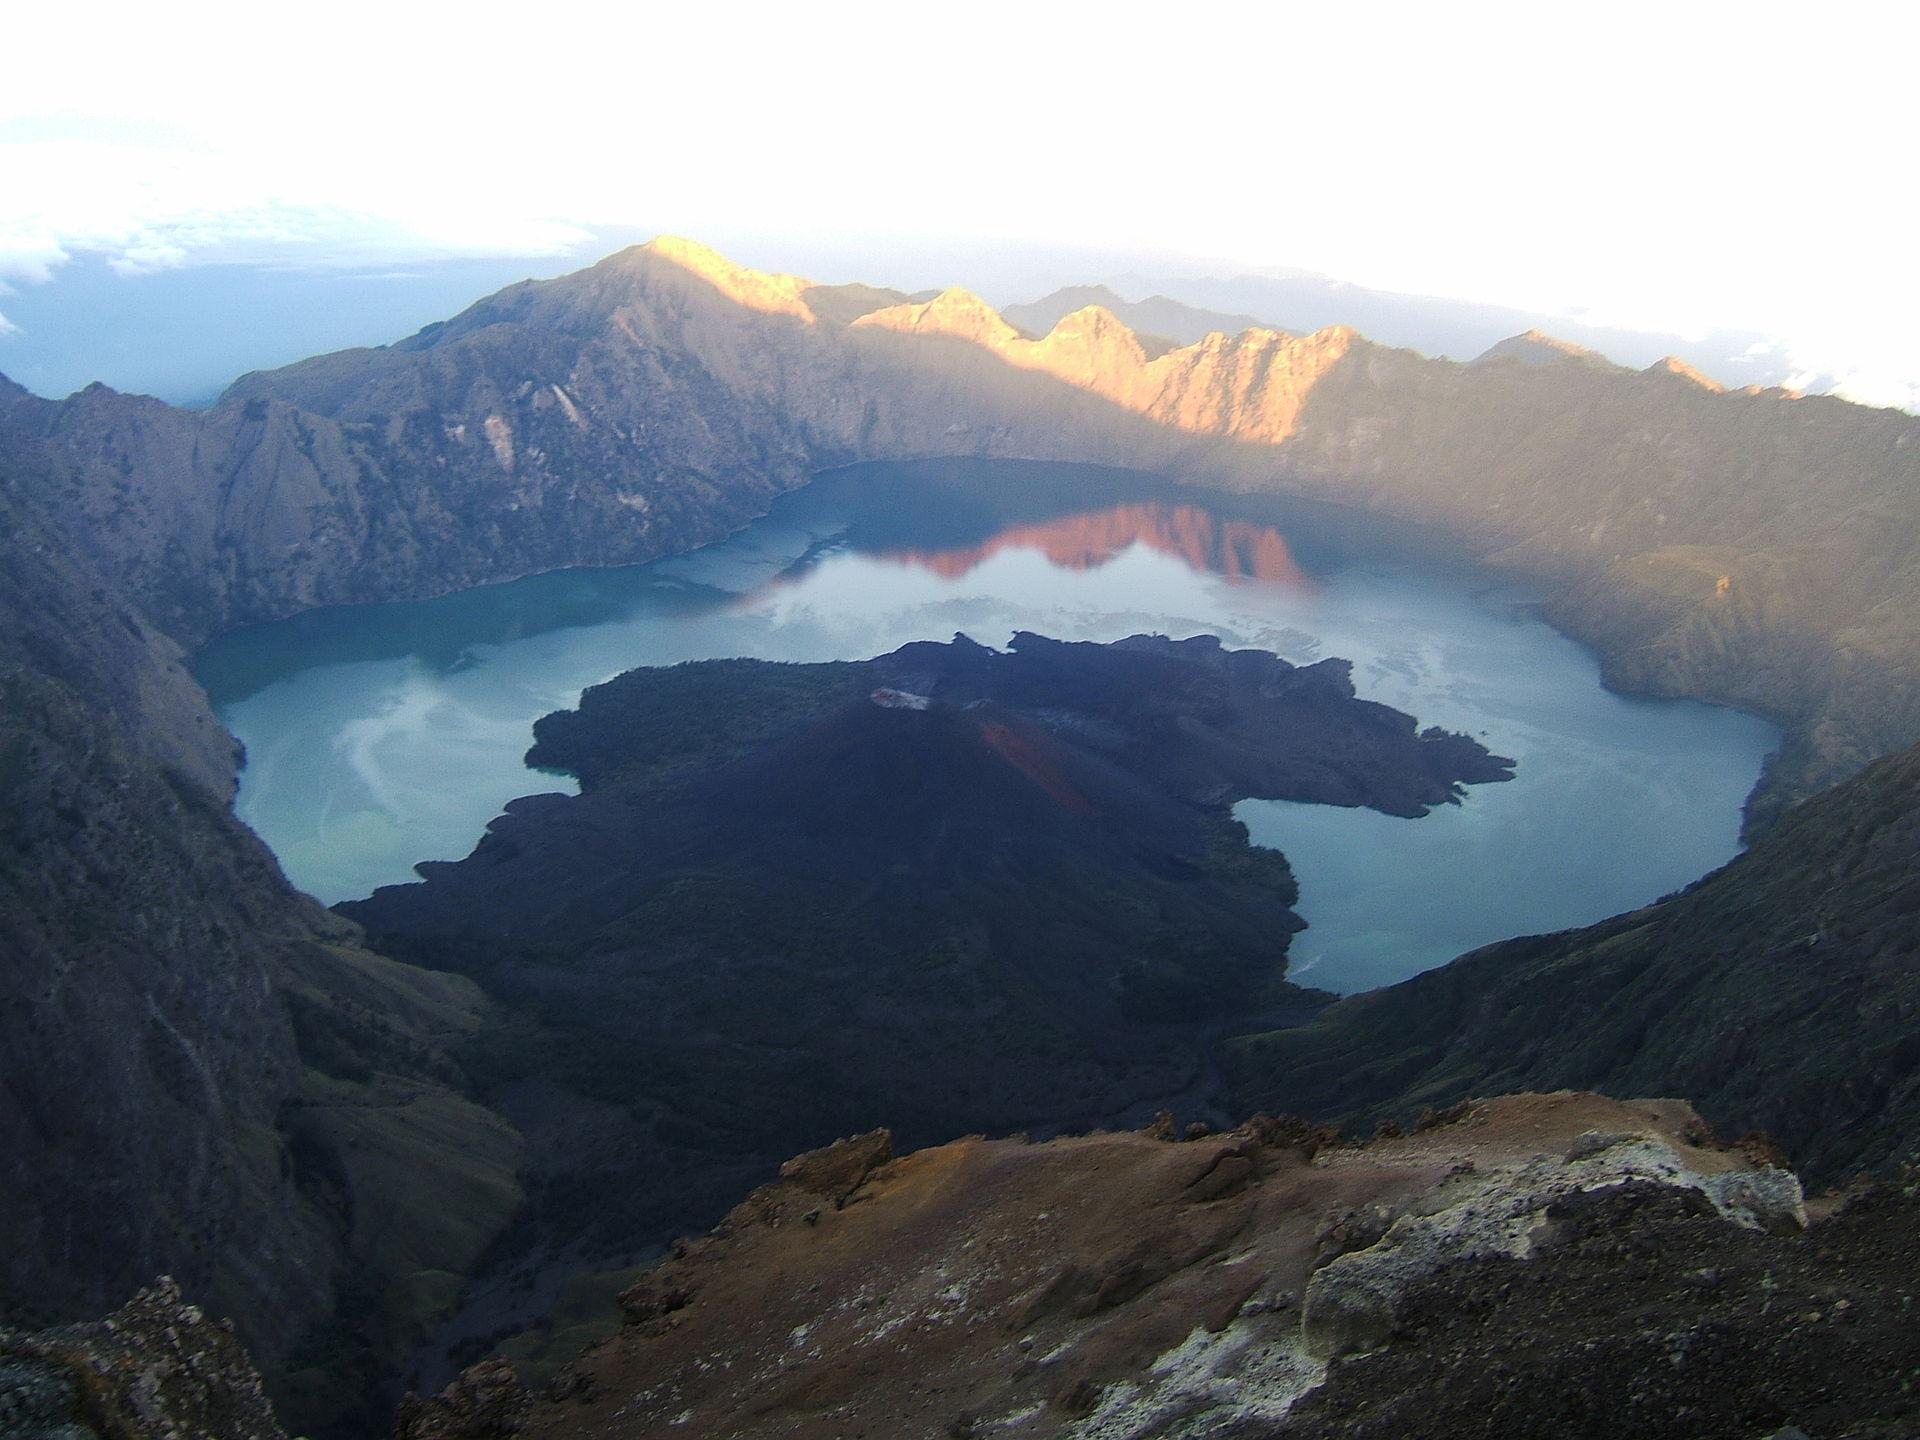 Segara Anak, gunung Rinjani   By Massew64 - Own work, CC BY-SA 3.0, https://commons.wikimedia.org/w/index.php?curid=11646186